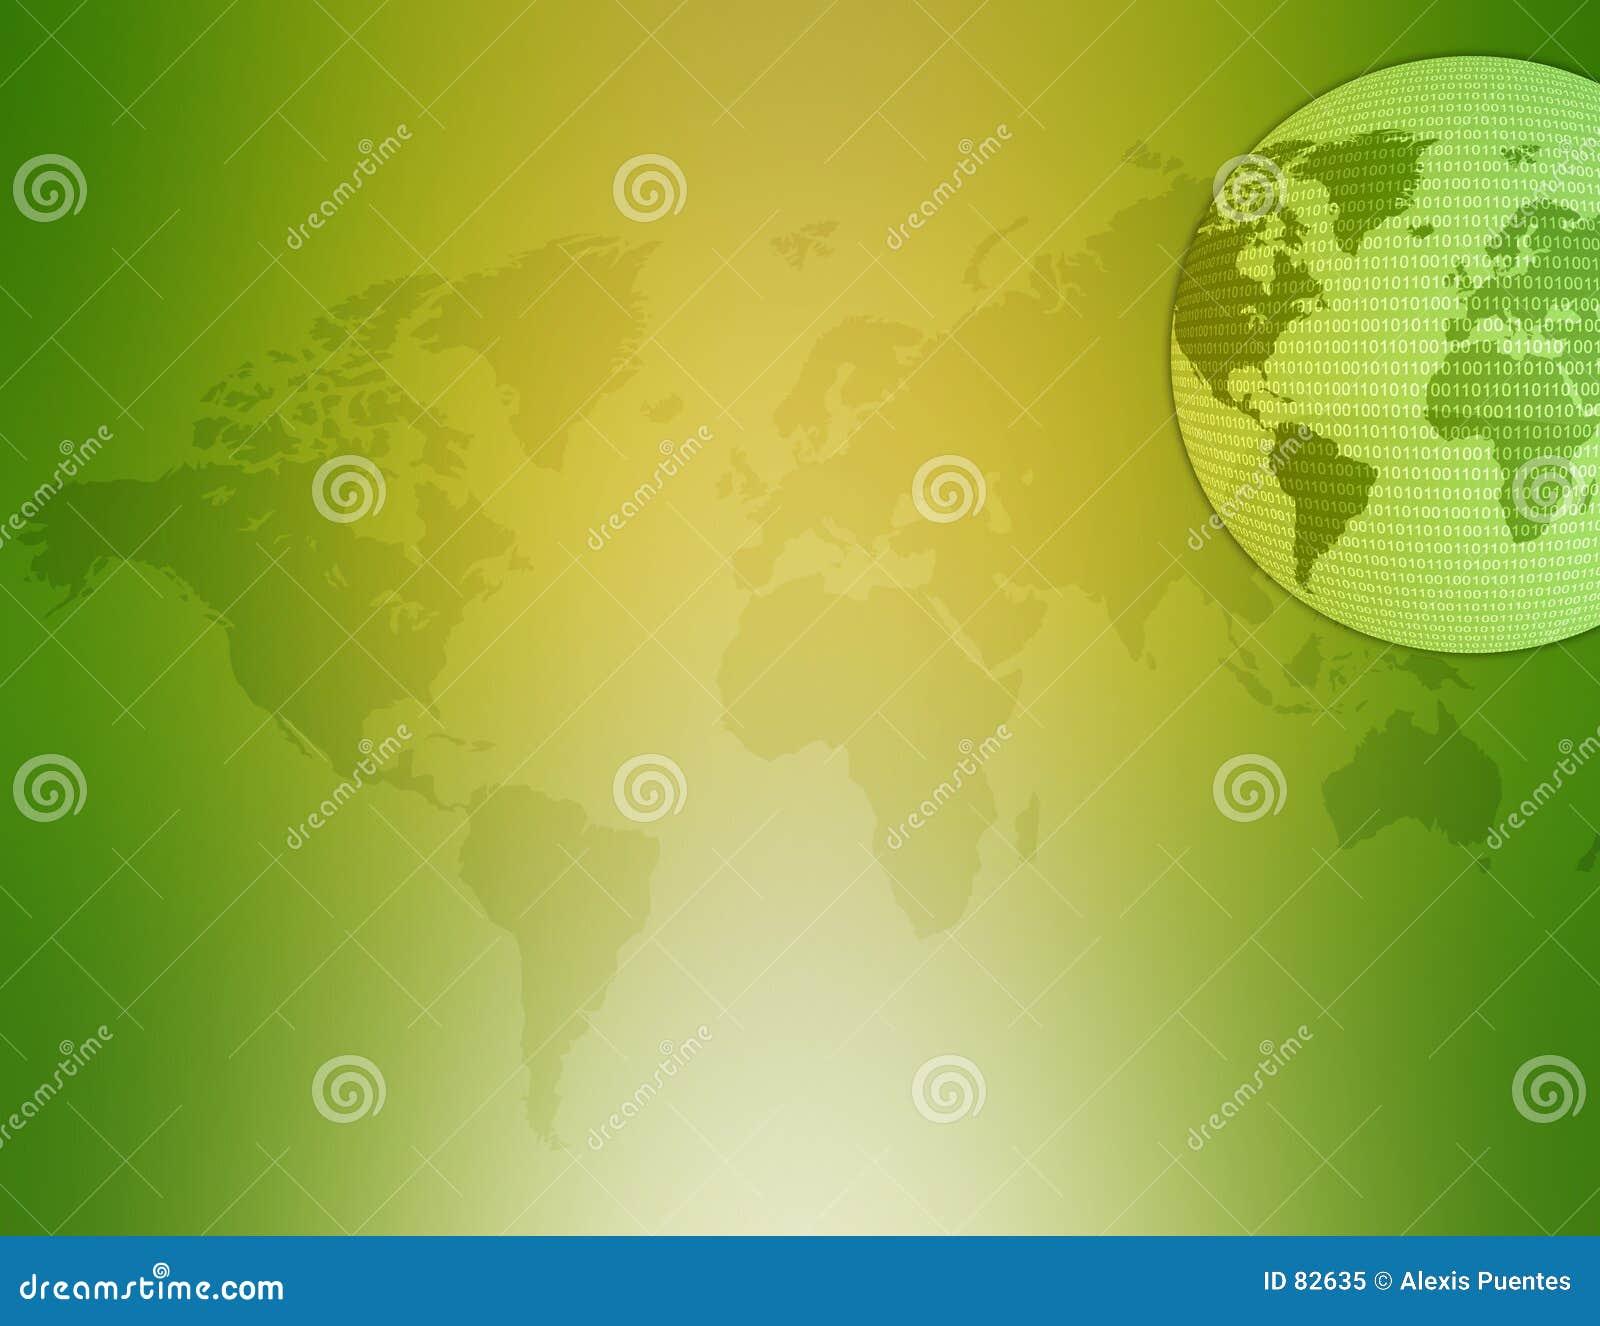 мир 02 карт